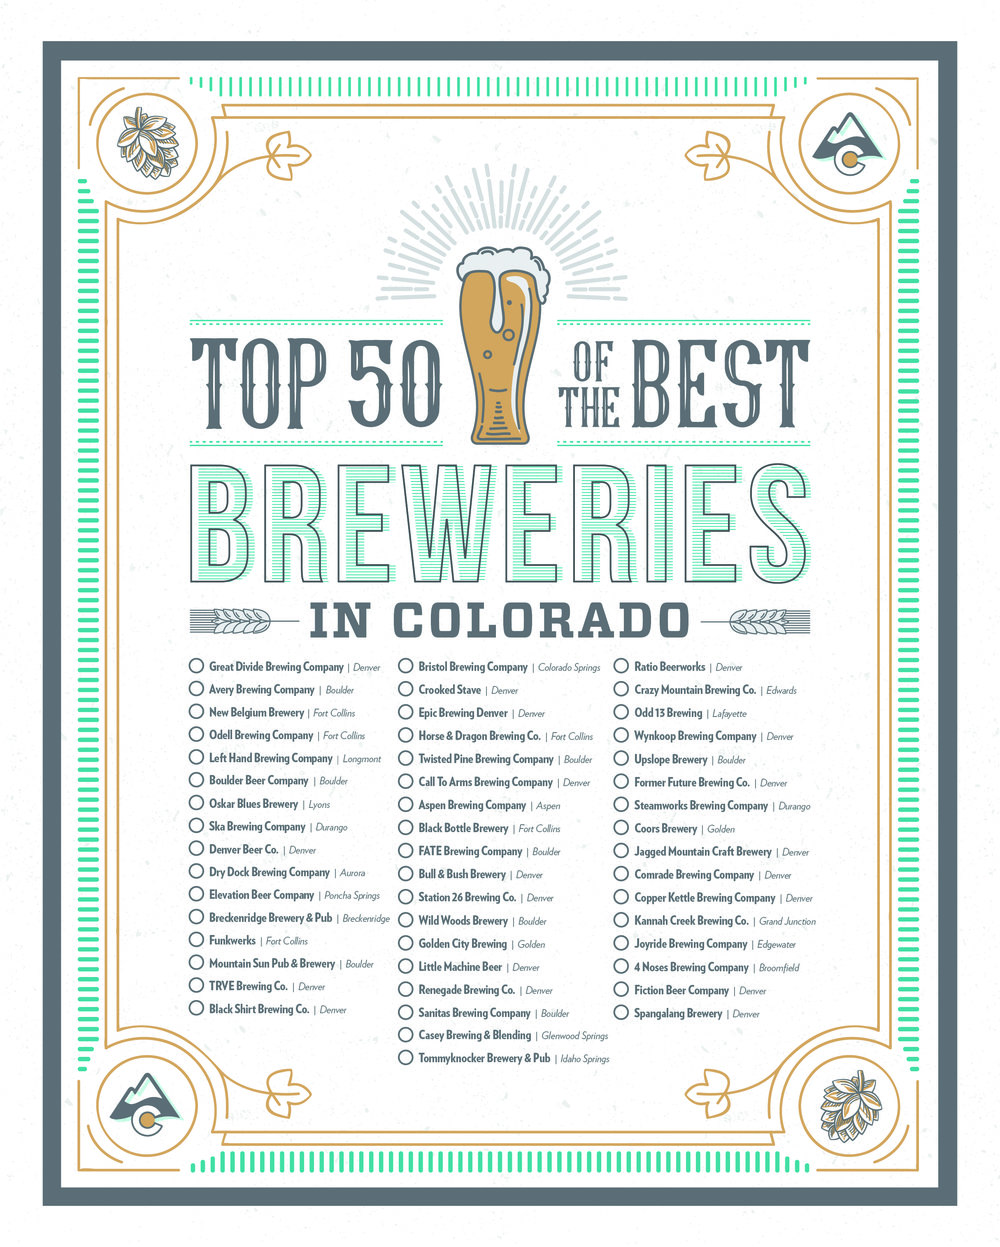 Breweries_Colorado-01.jpg